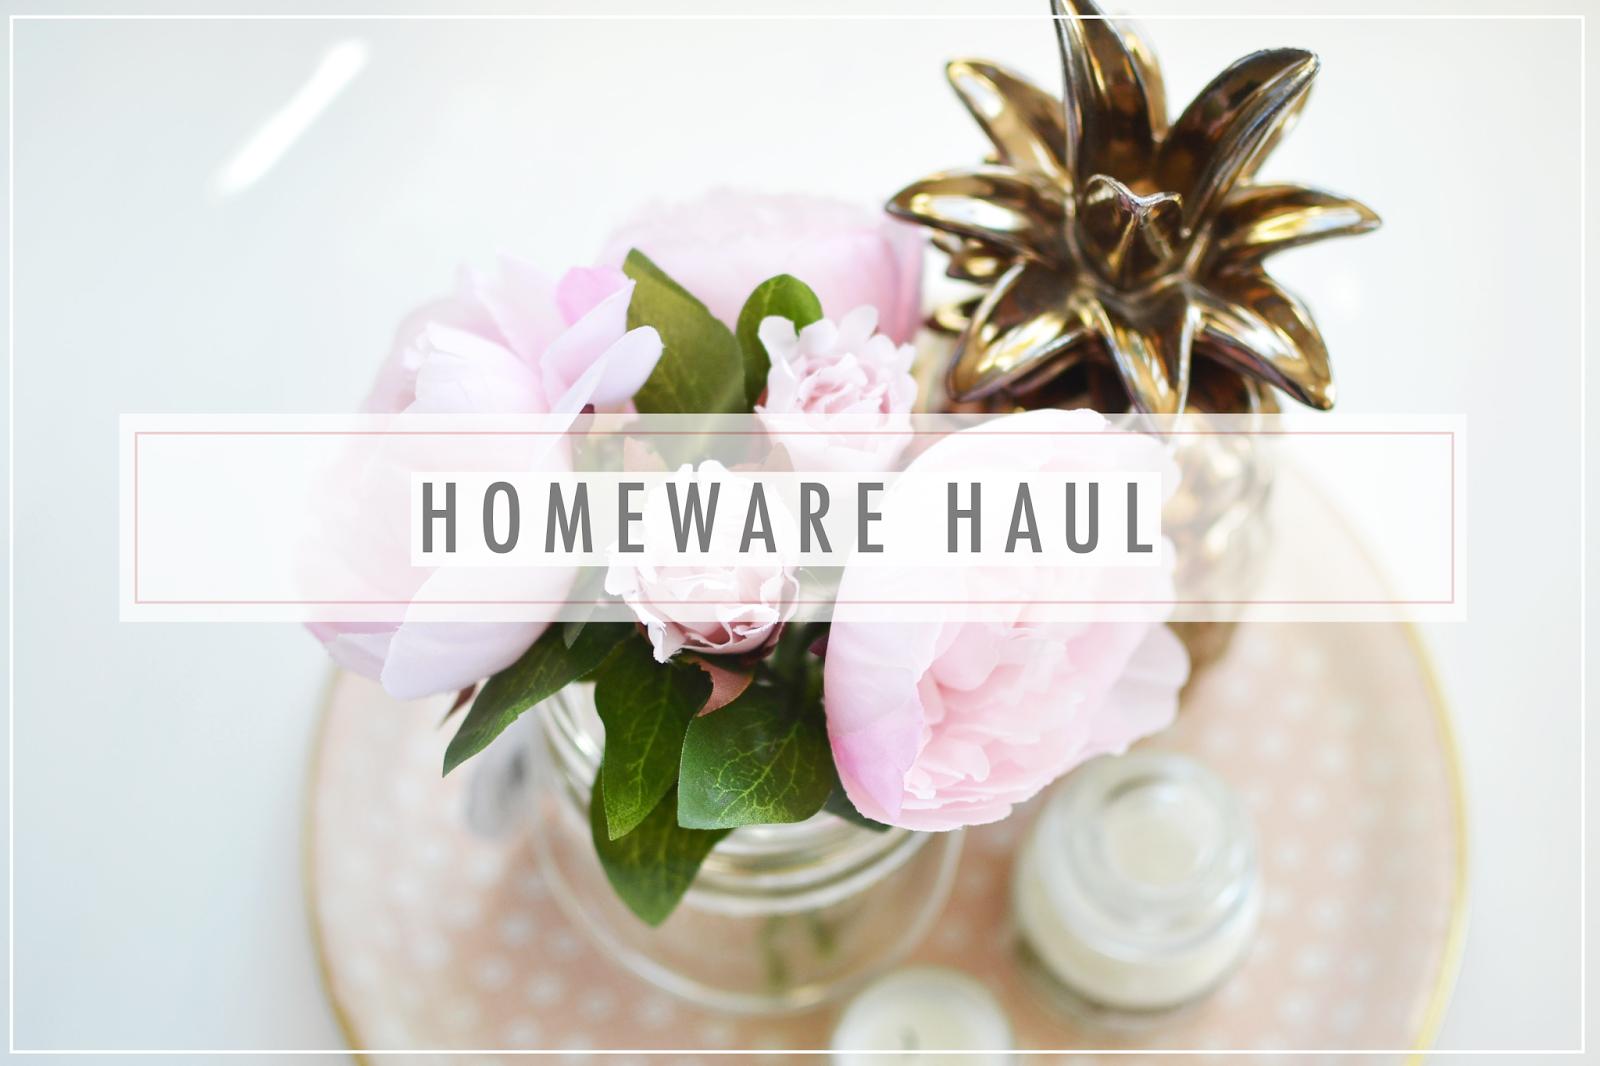 home ware haul, bhs home range, blogger haul